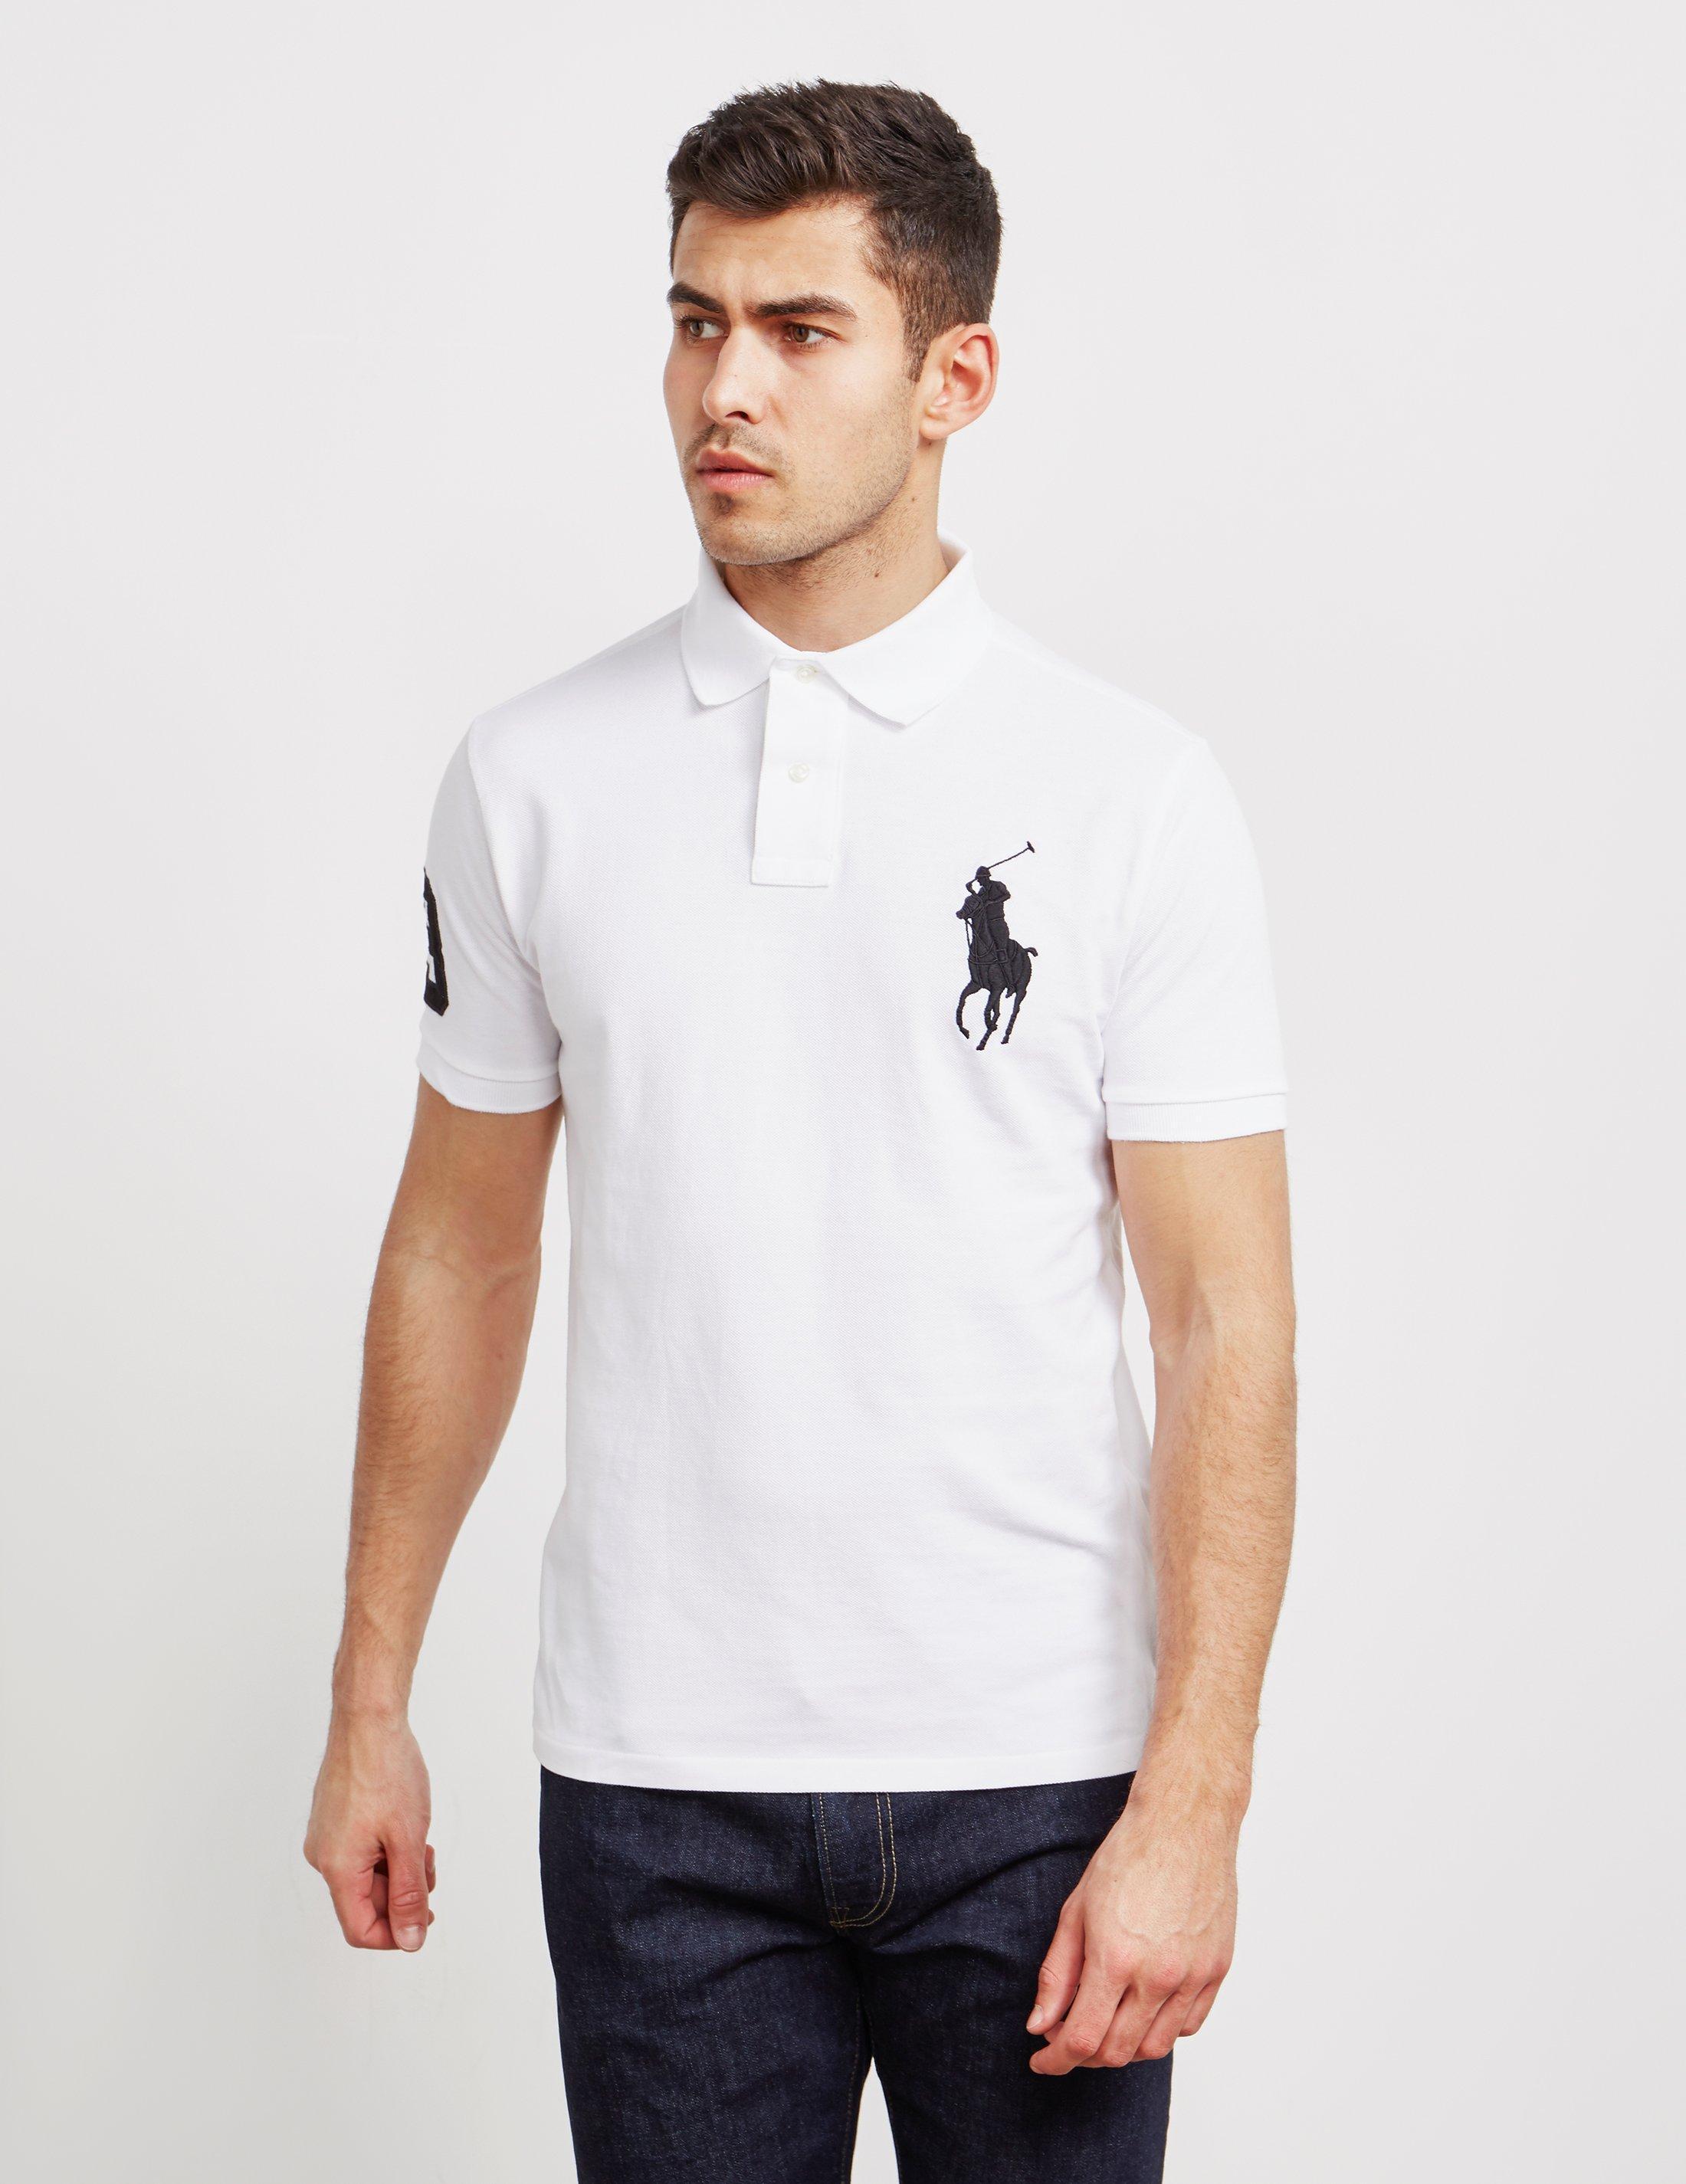 1cea6c19a2d2 Polo Ralph Lauren Large Embroidered Logo Short Sleeve Polo Shirt ...